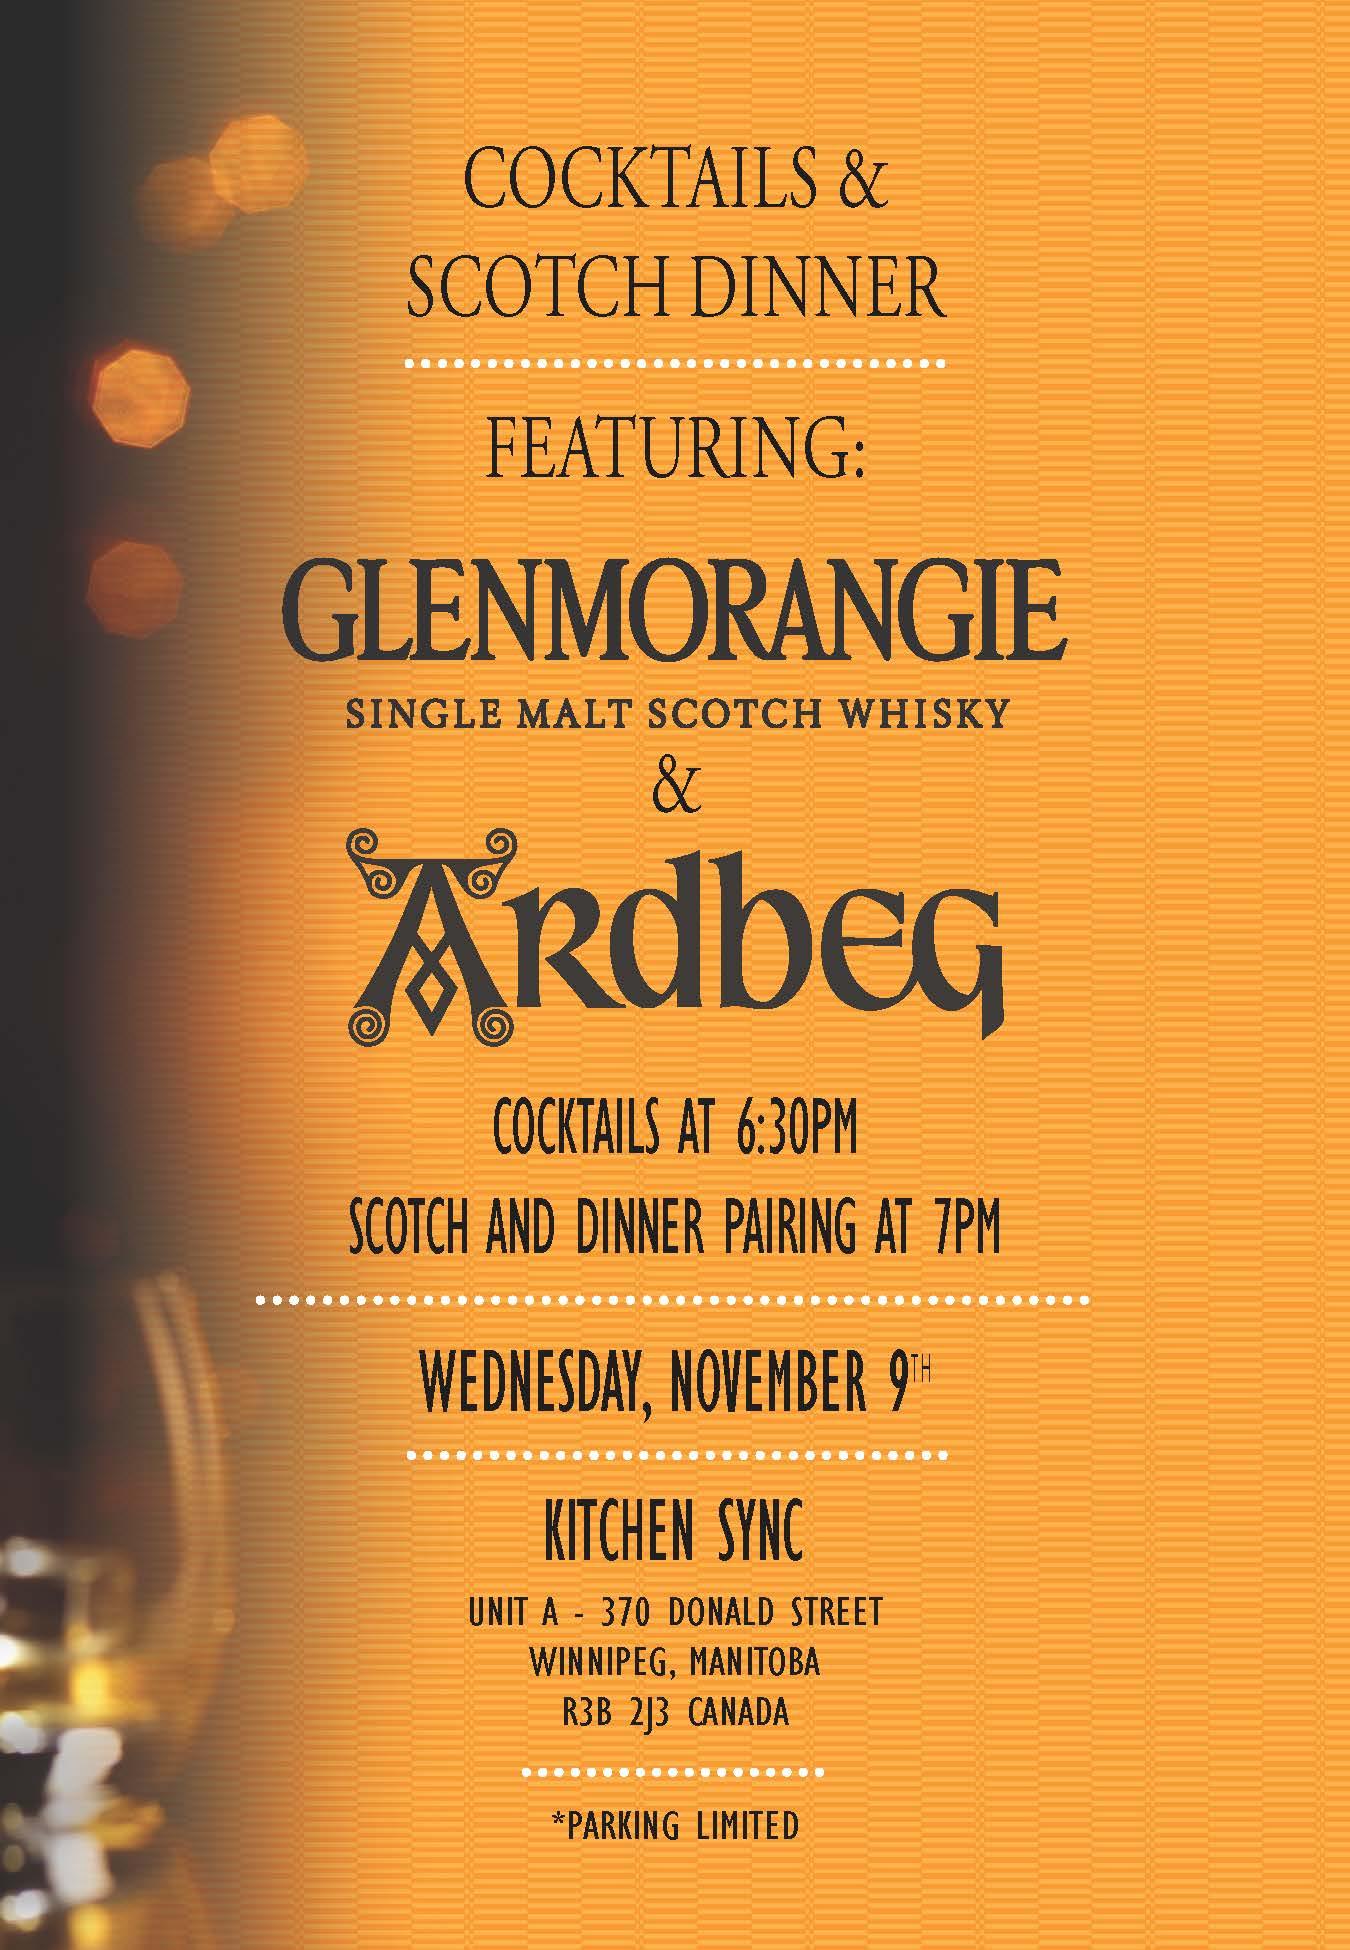 Glenmorangie/Ardbeg Scotch Dinner